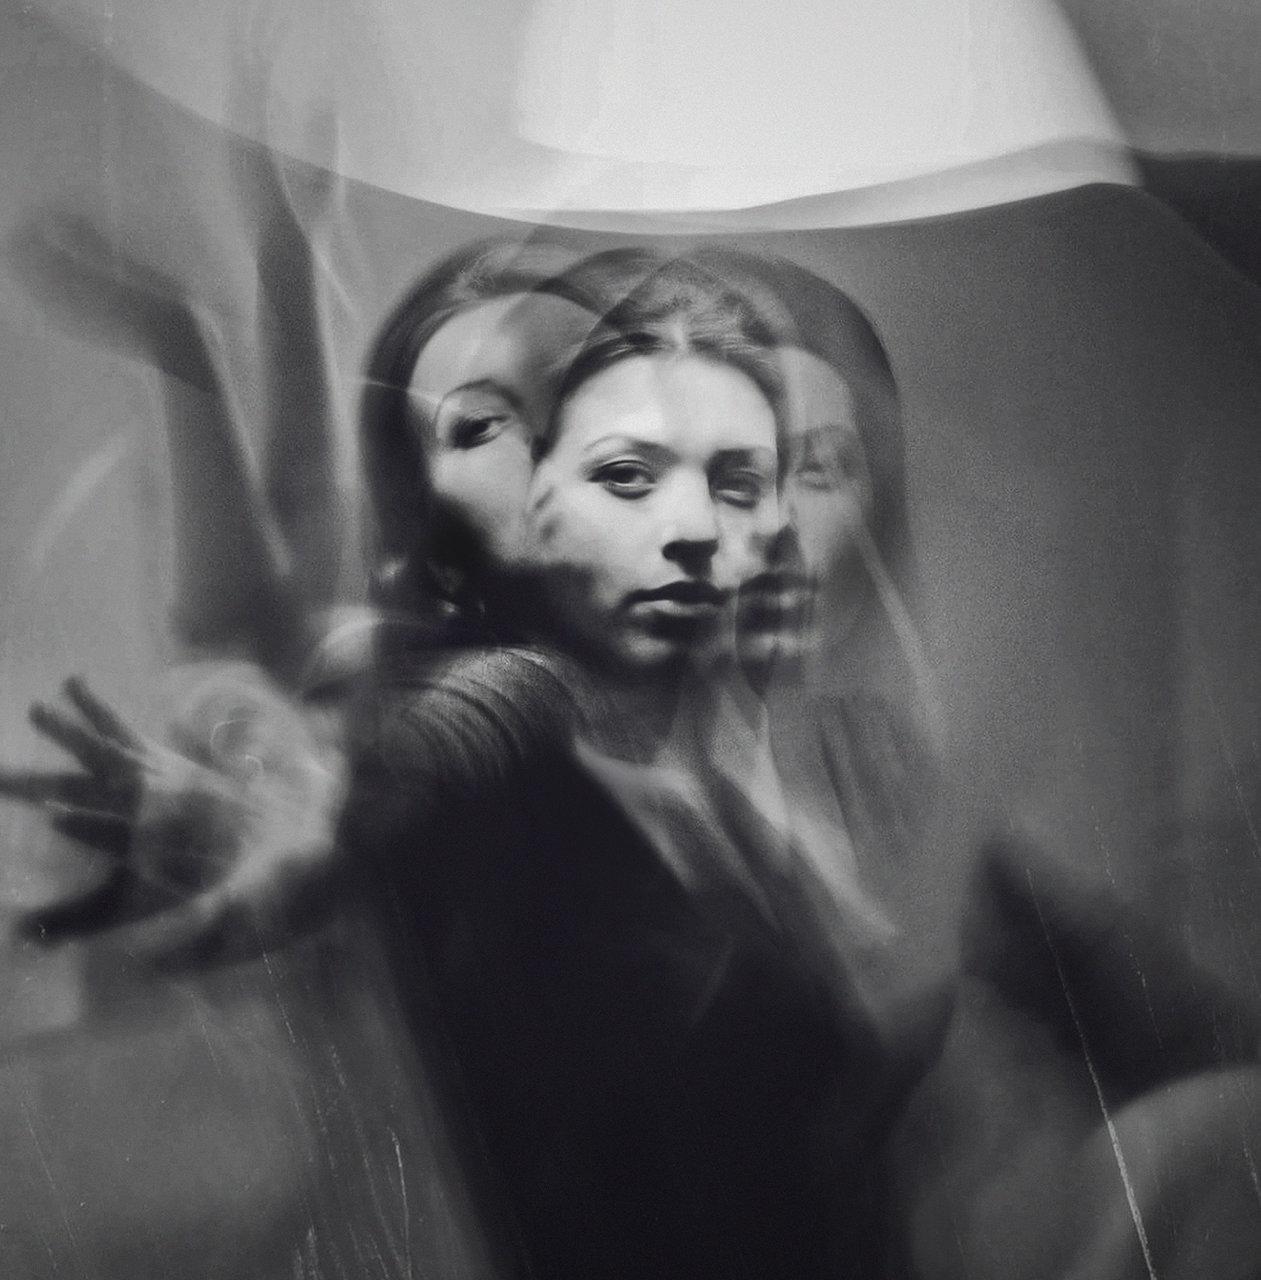 Автопортрет | Author Tatyana Chohadzhieva - shocolad | PHOTO FORUM